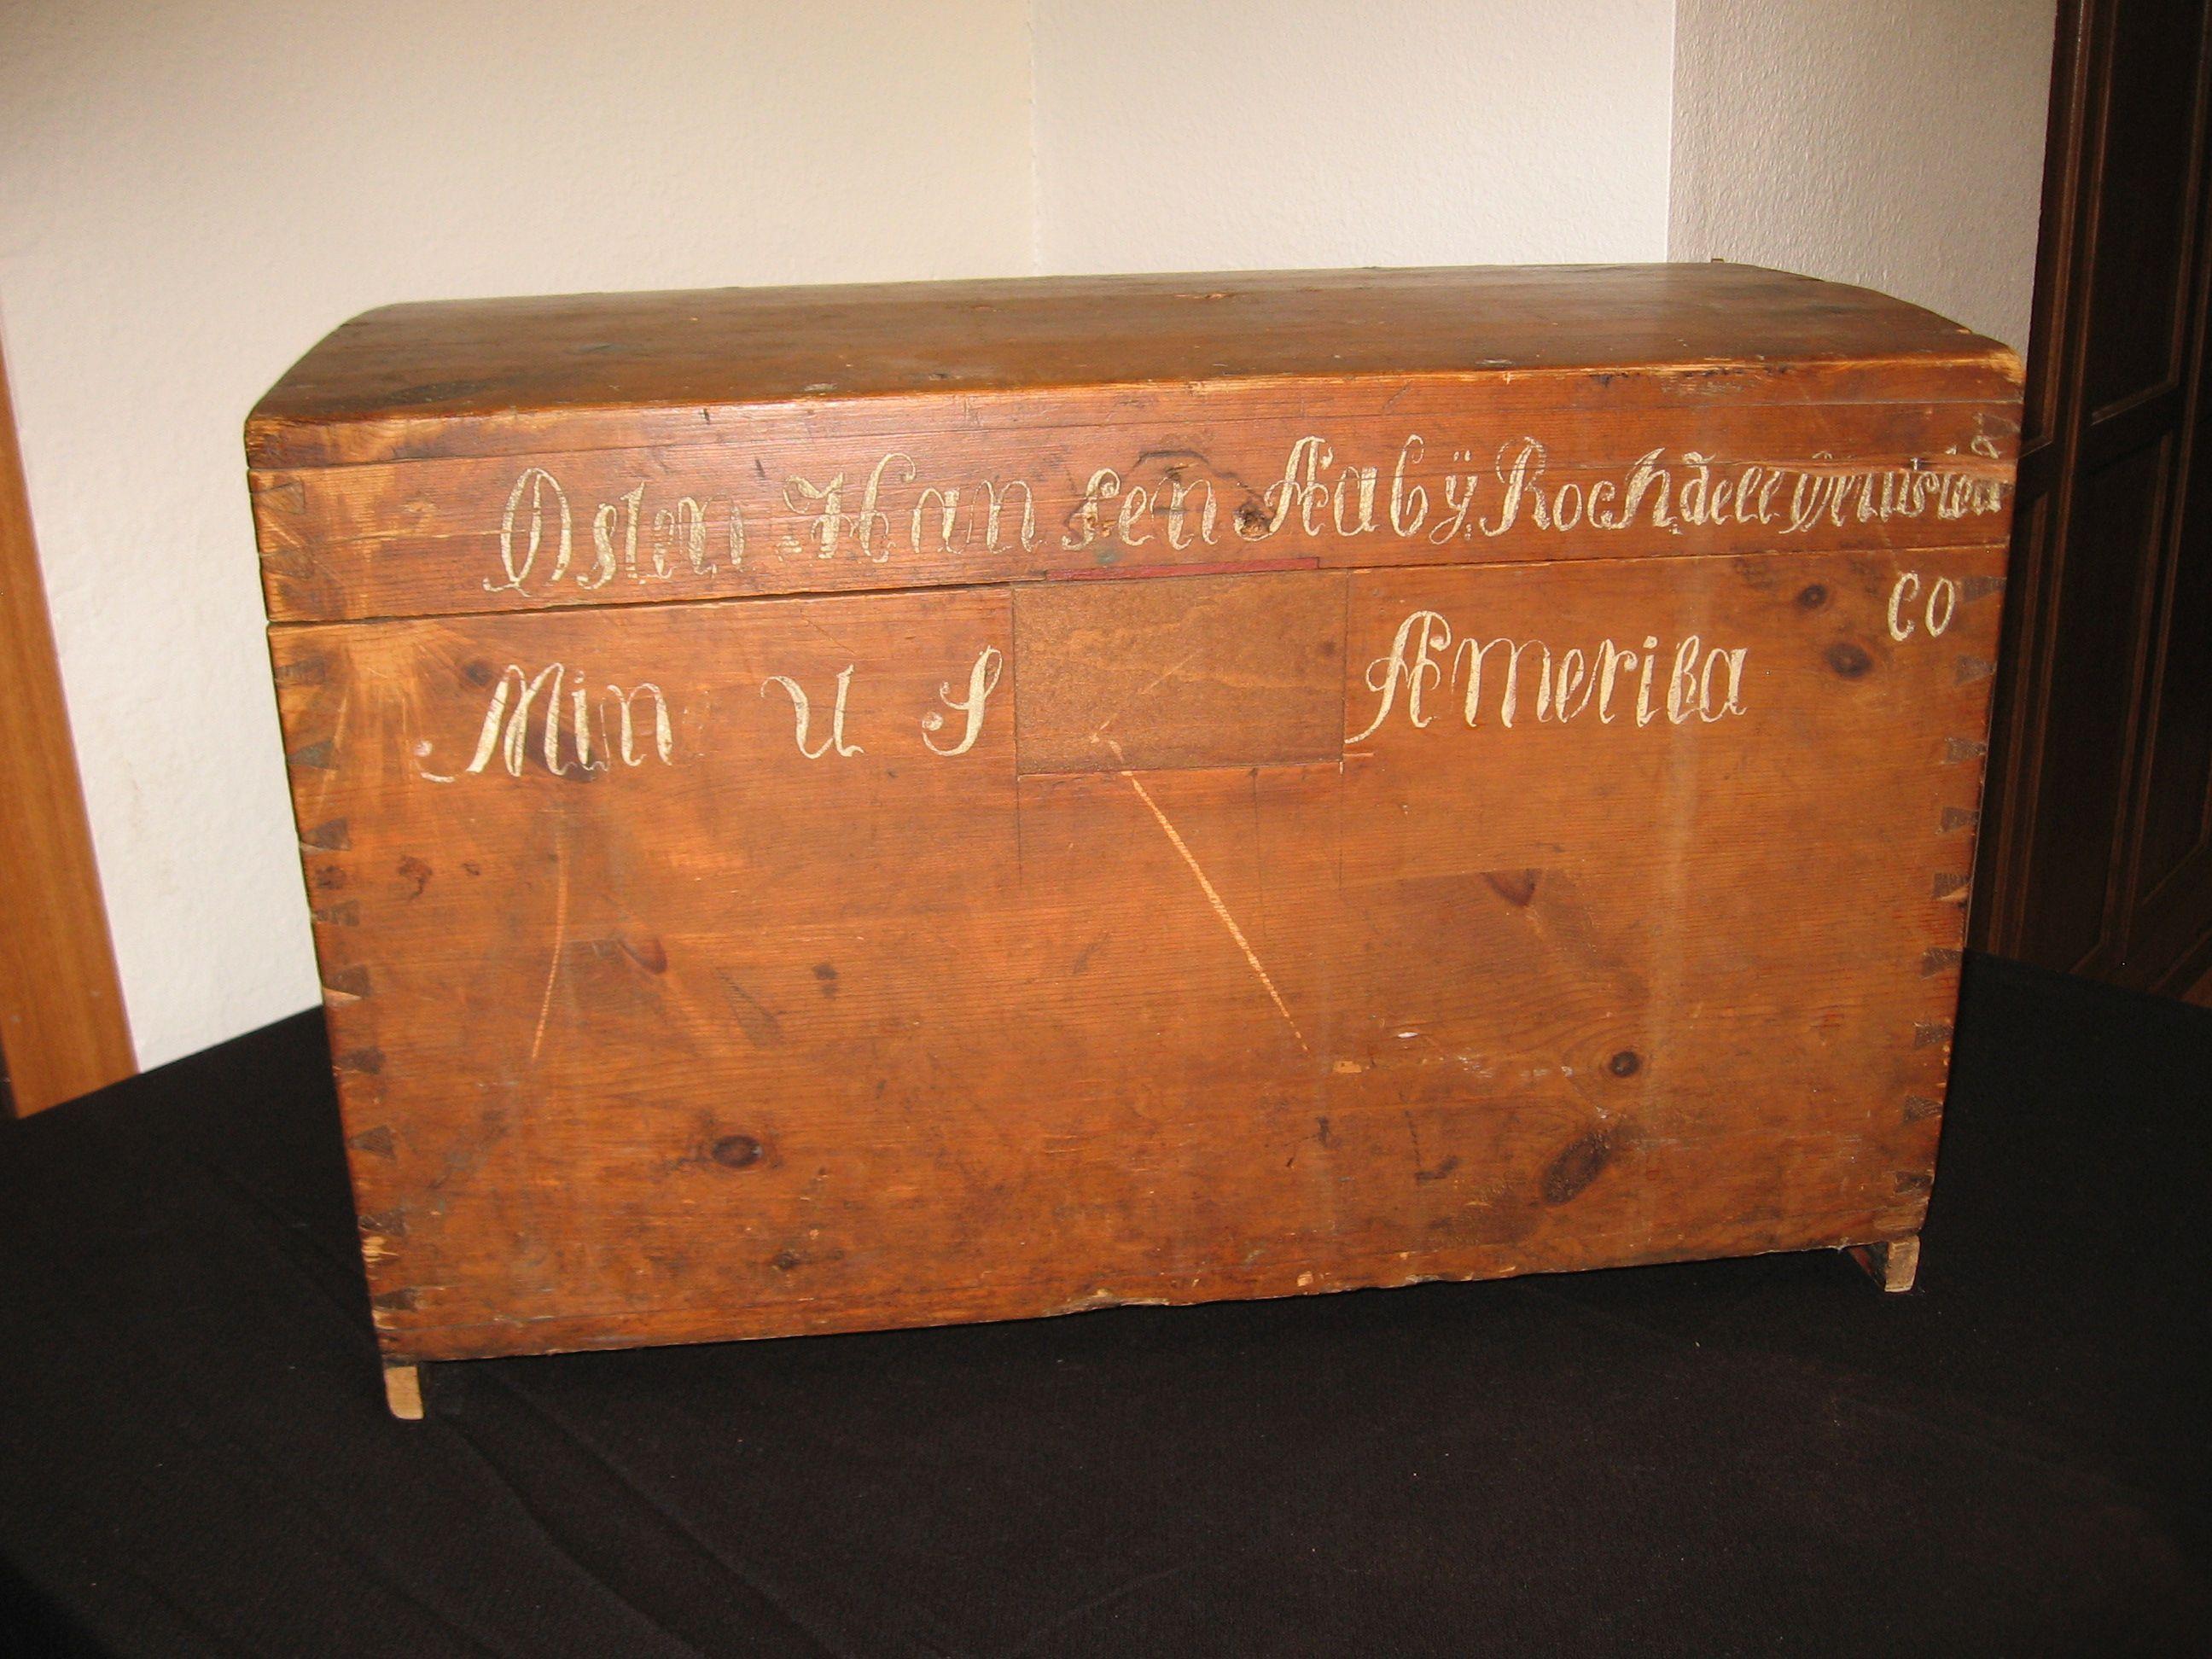 kuhlman auction service